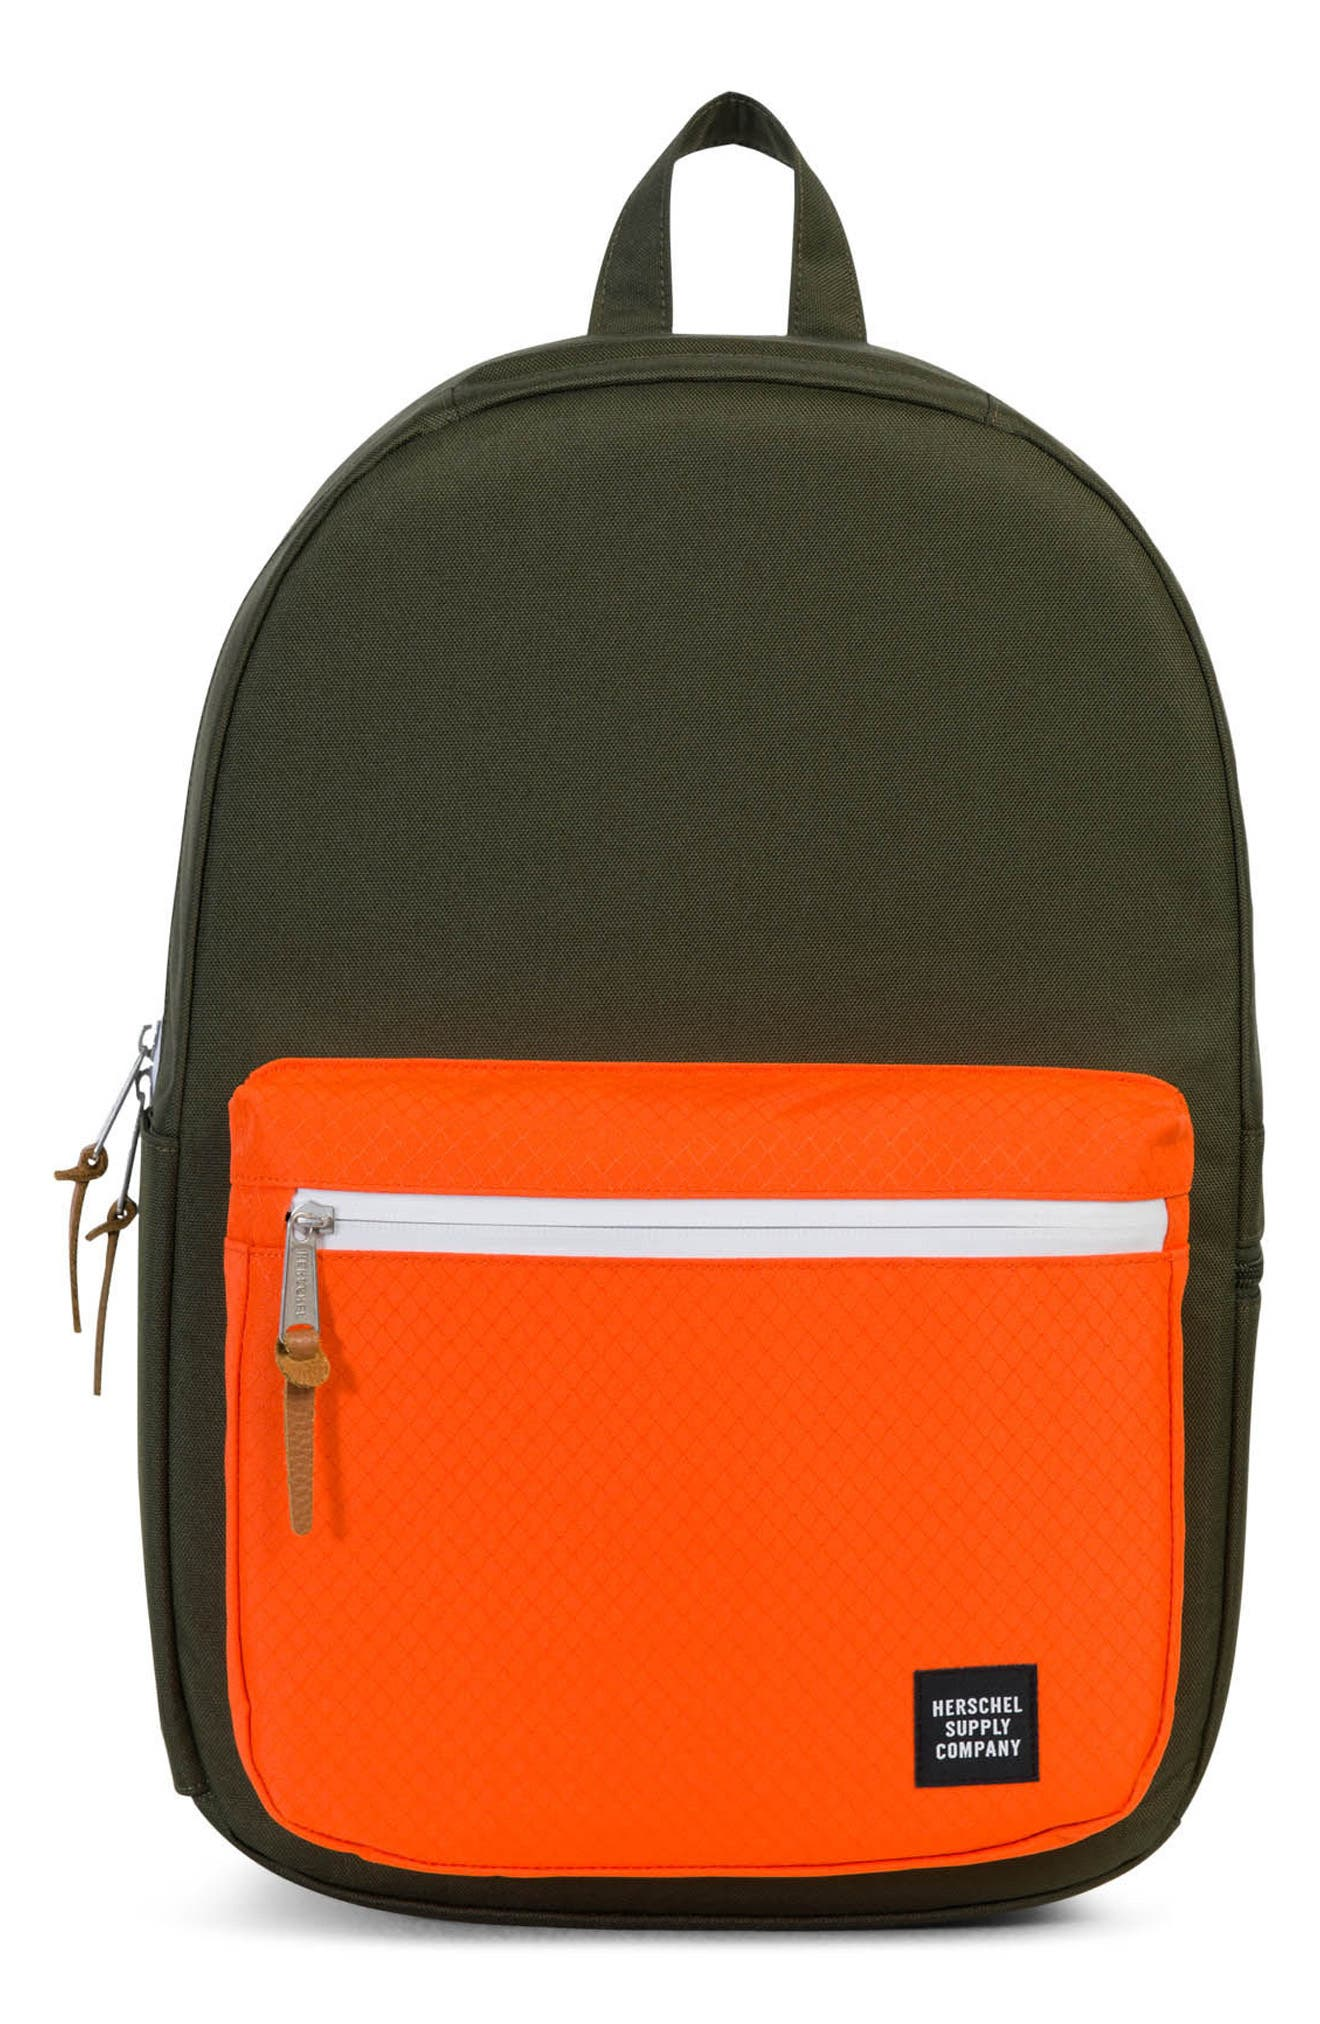 Main Image - Herschel Supply Co. Harrison Backpack